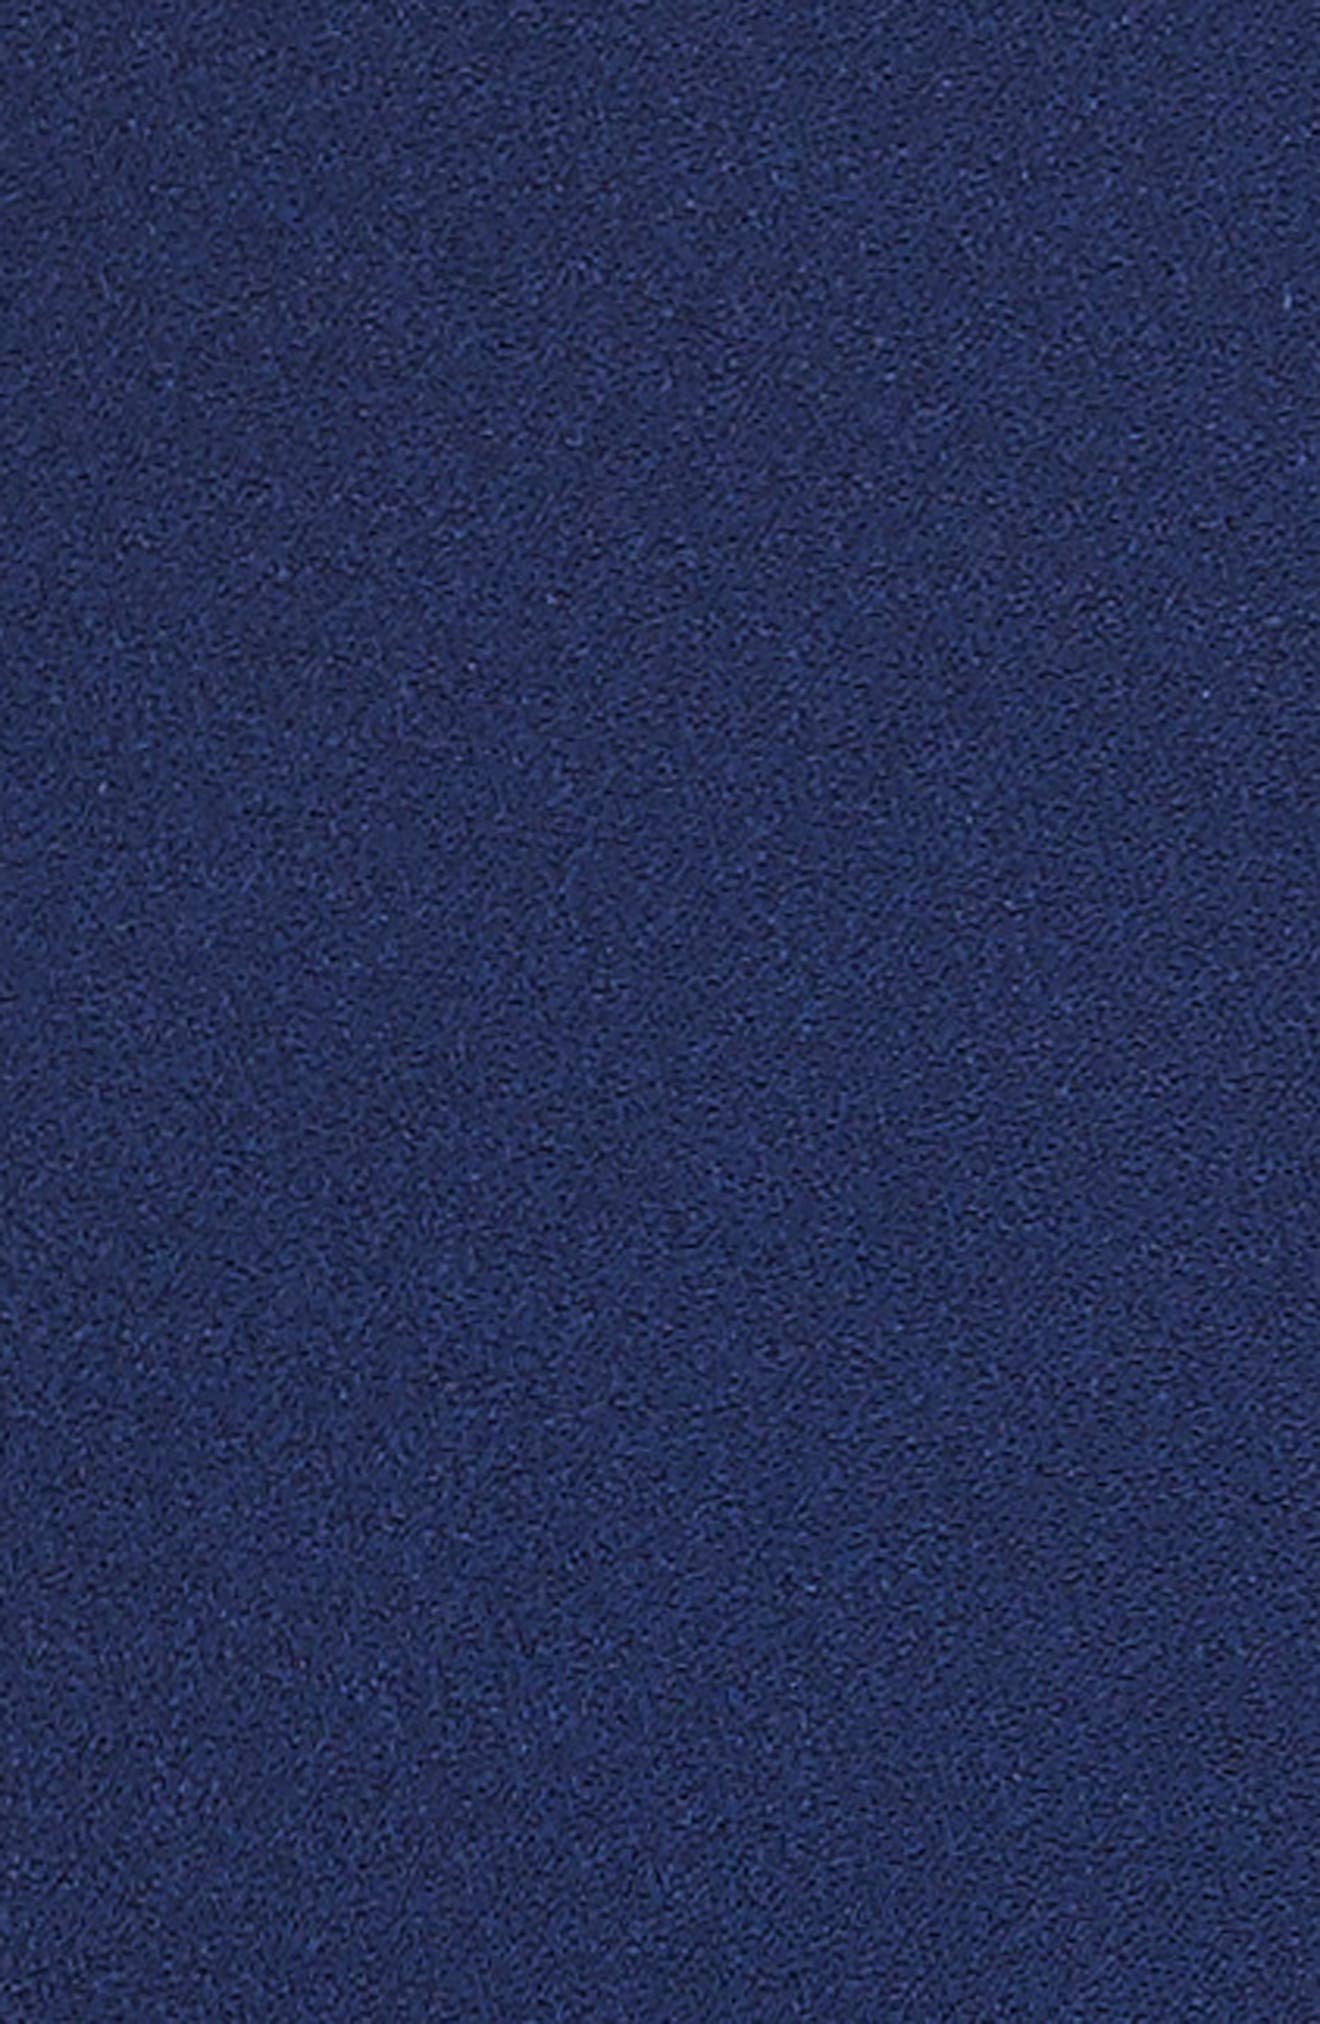 Drawstring Cady Jumpsuit,                             Alternate thumbnail 5, color,                             473